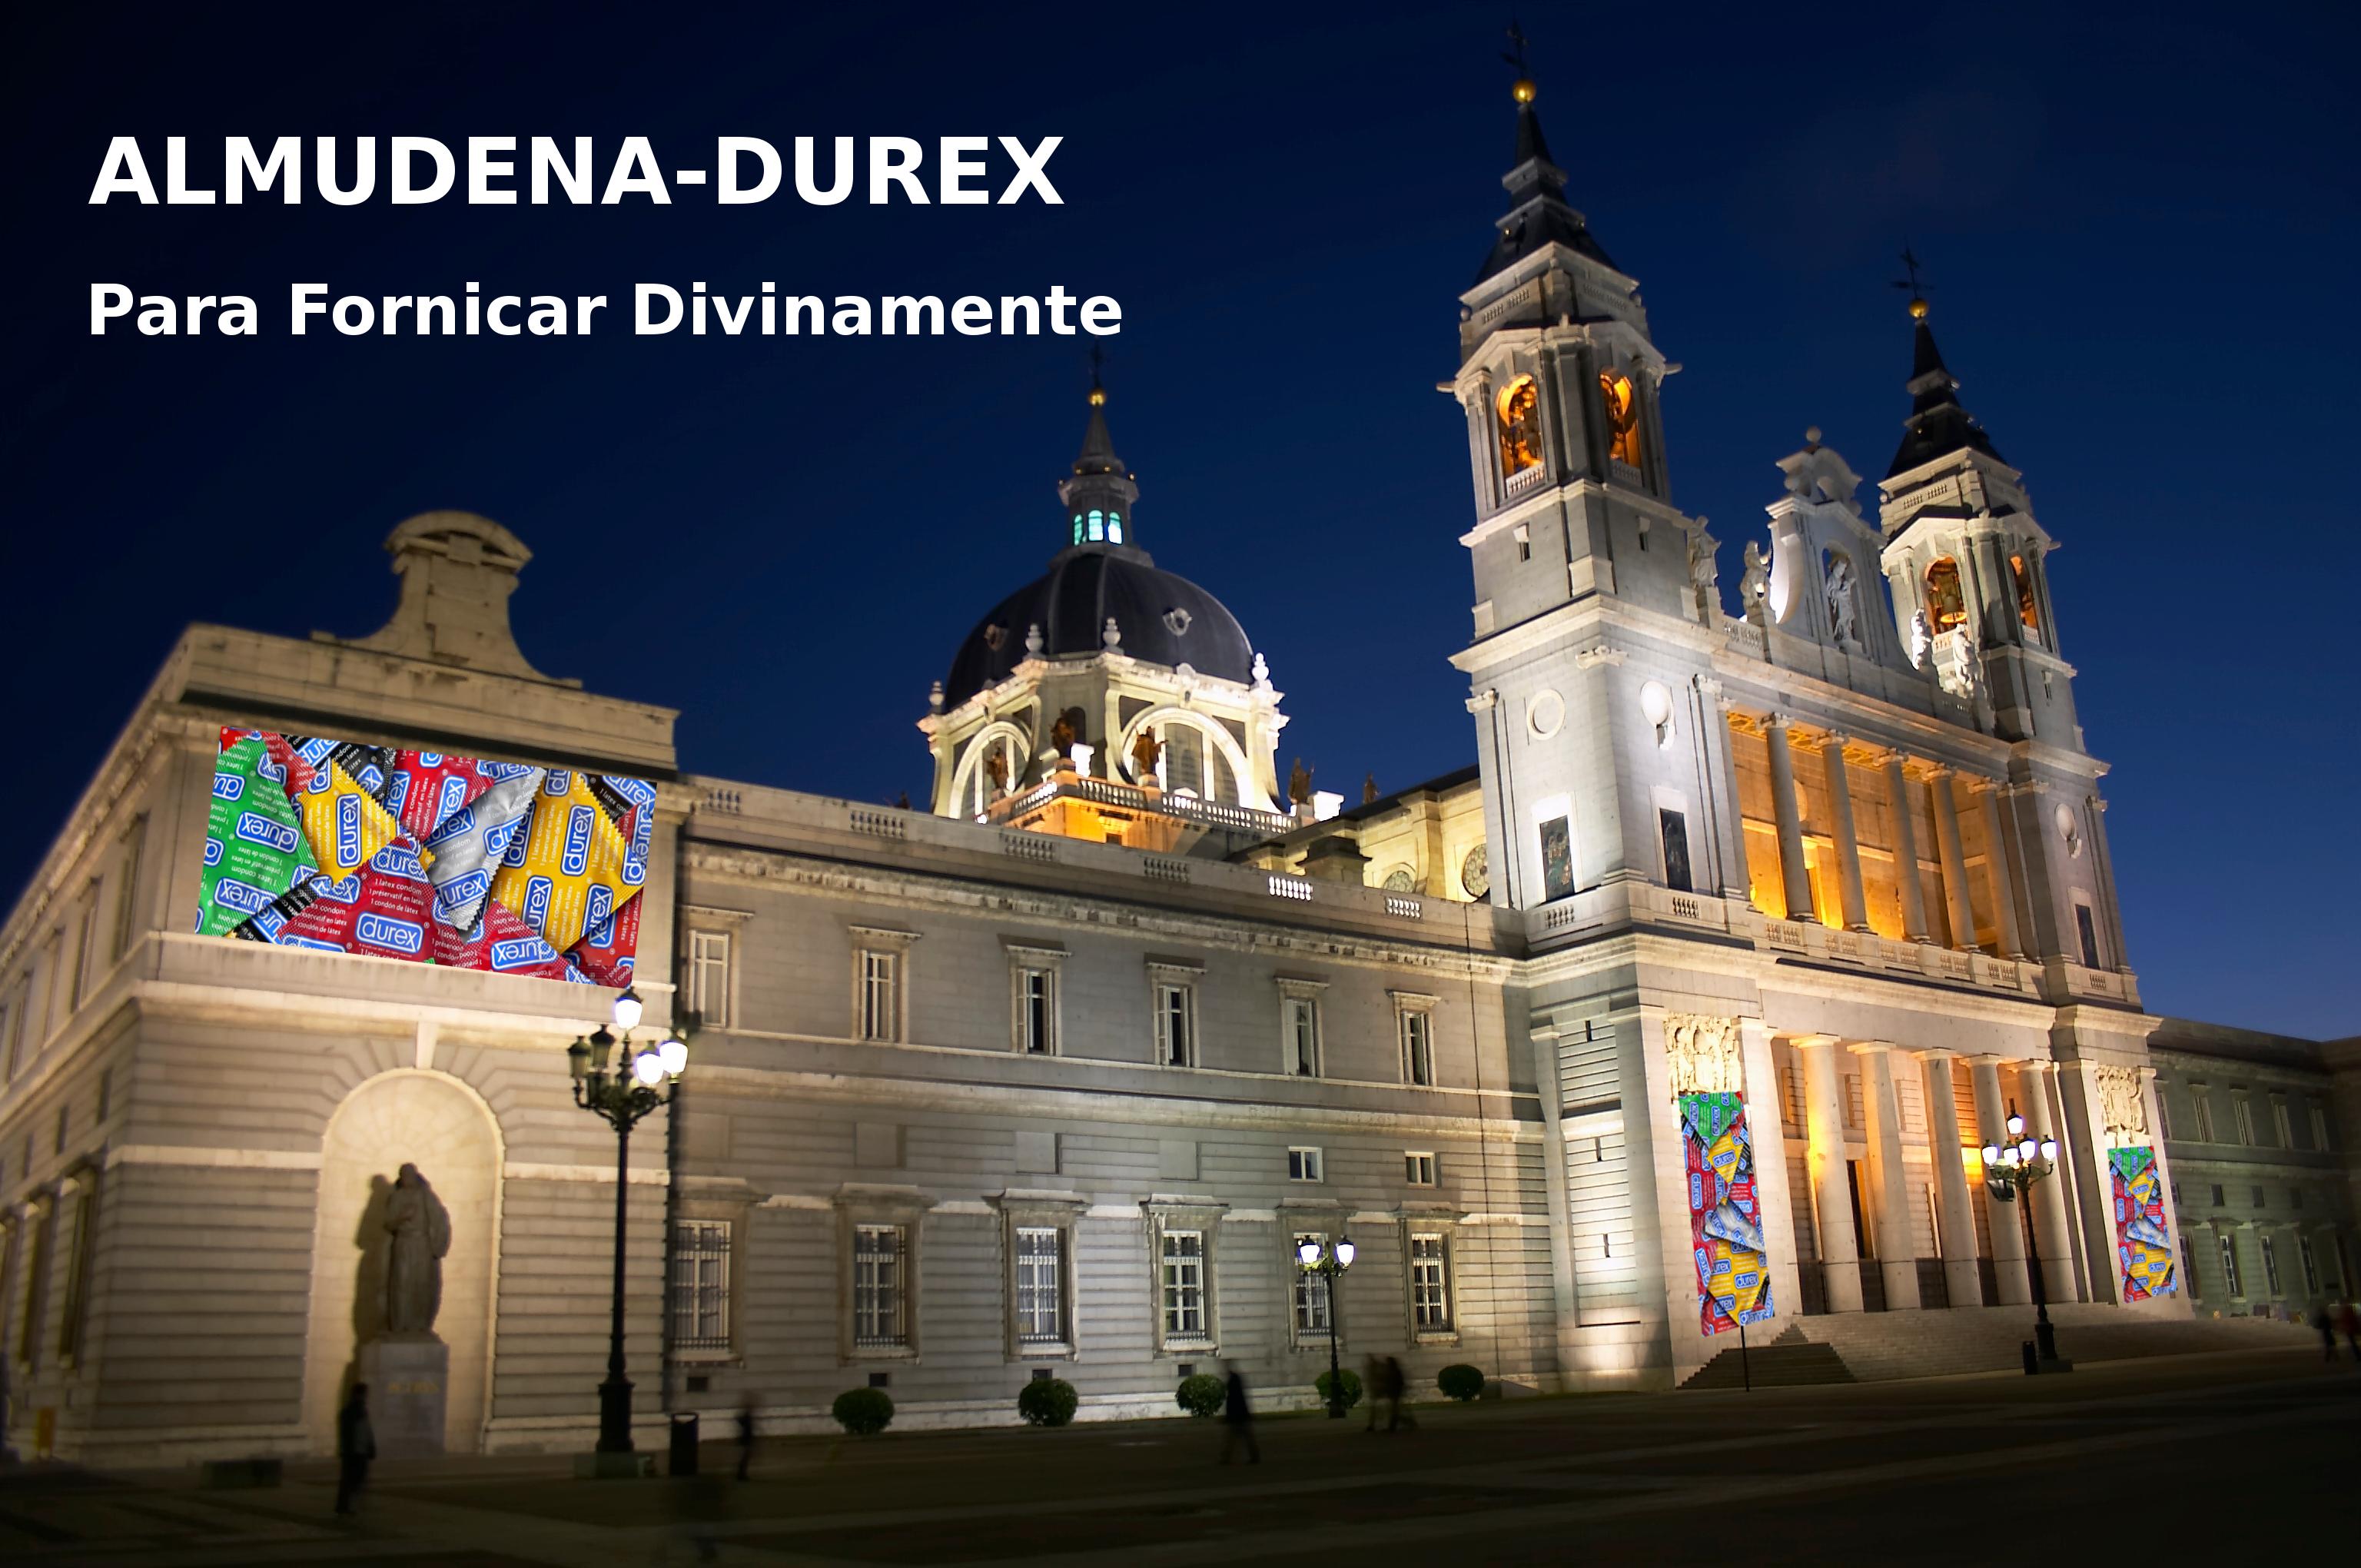 LaAlmudena-Durex